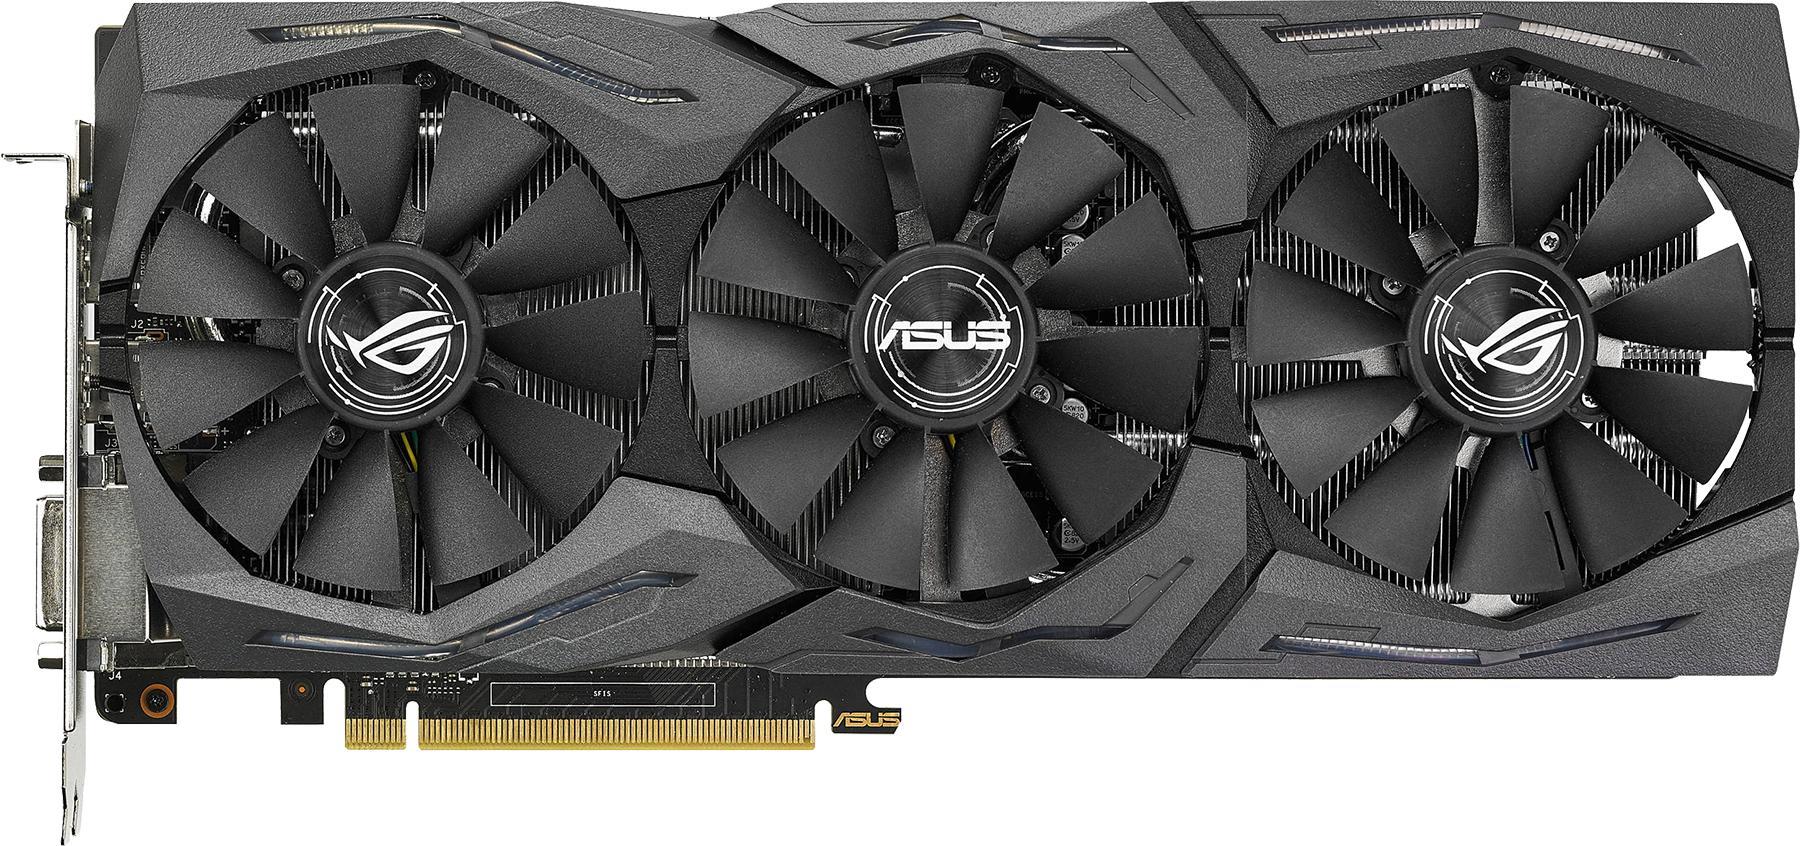 Asus ROG Strix Radeon RX 480 Gaming OC